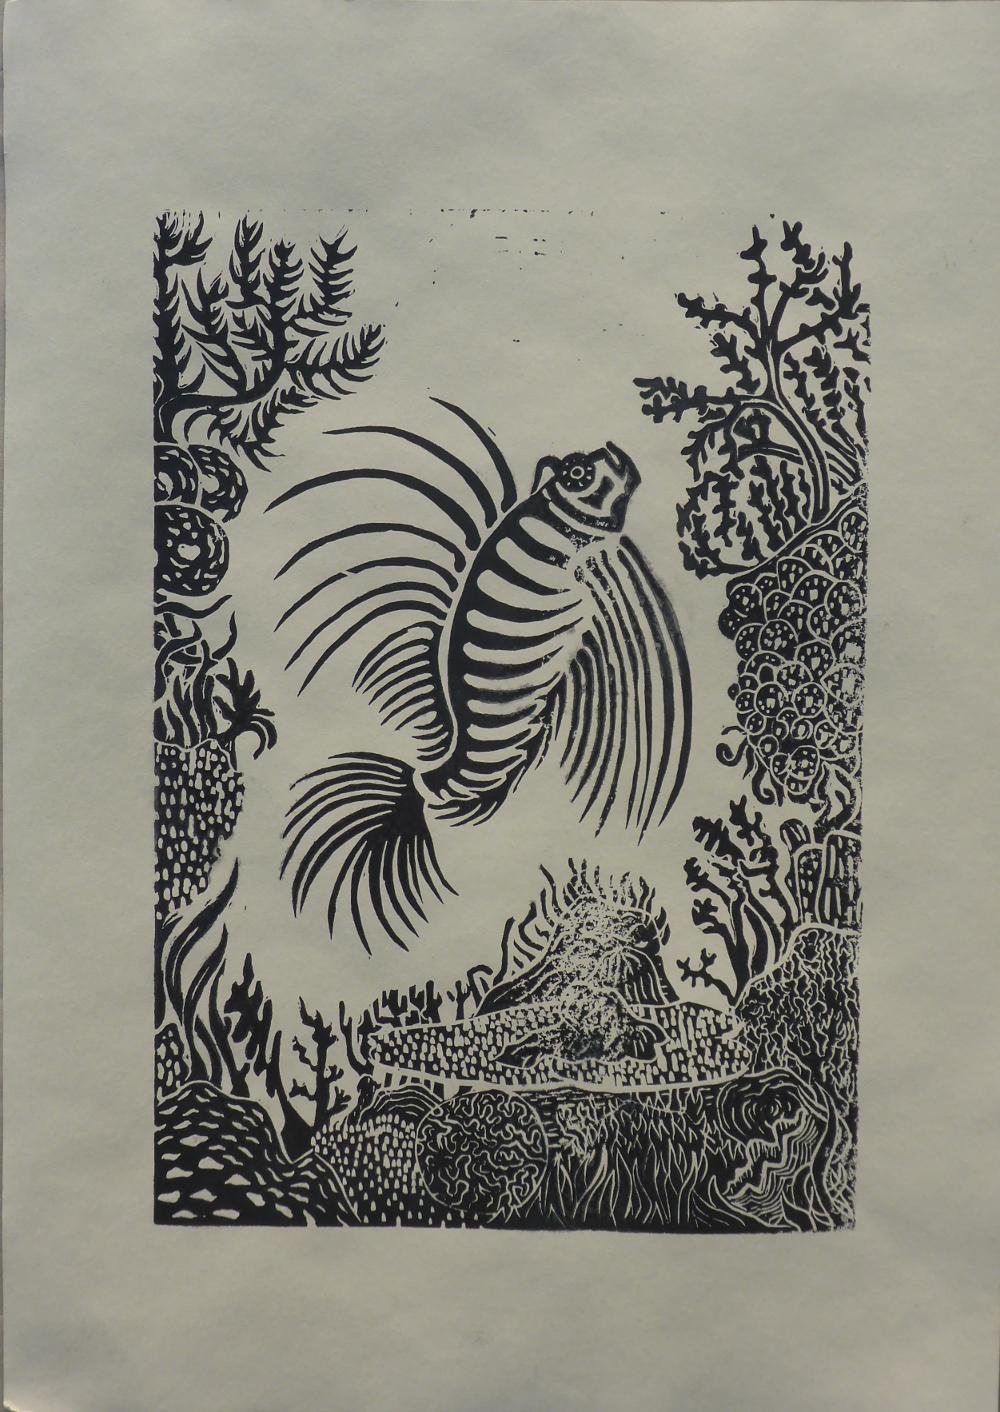 """The reef I"", 2019, linocut on paper, 30 x 42 cm"